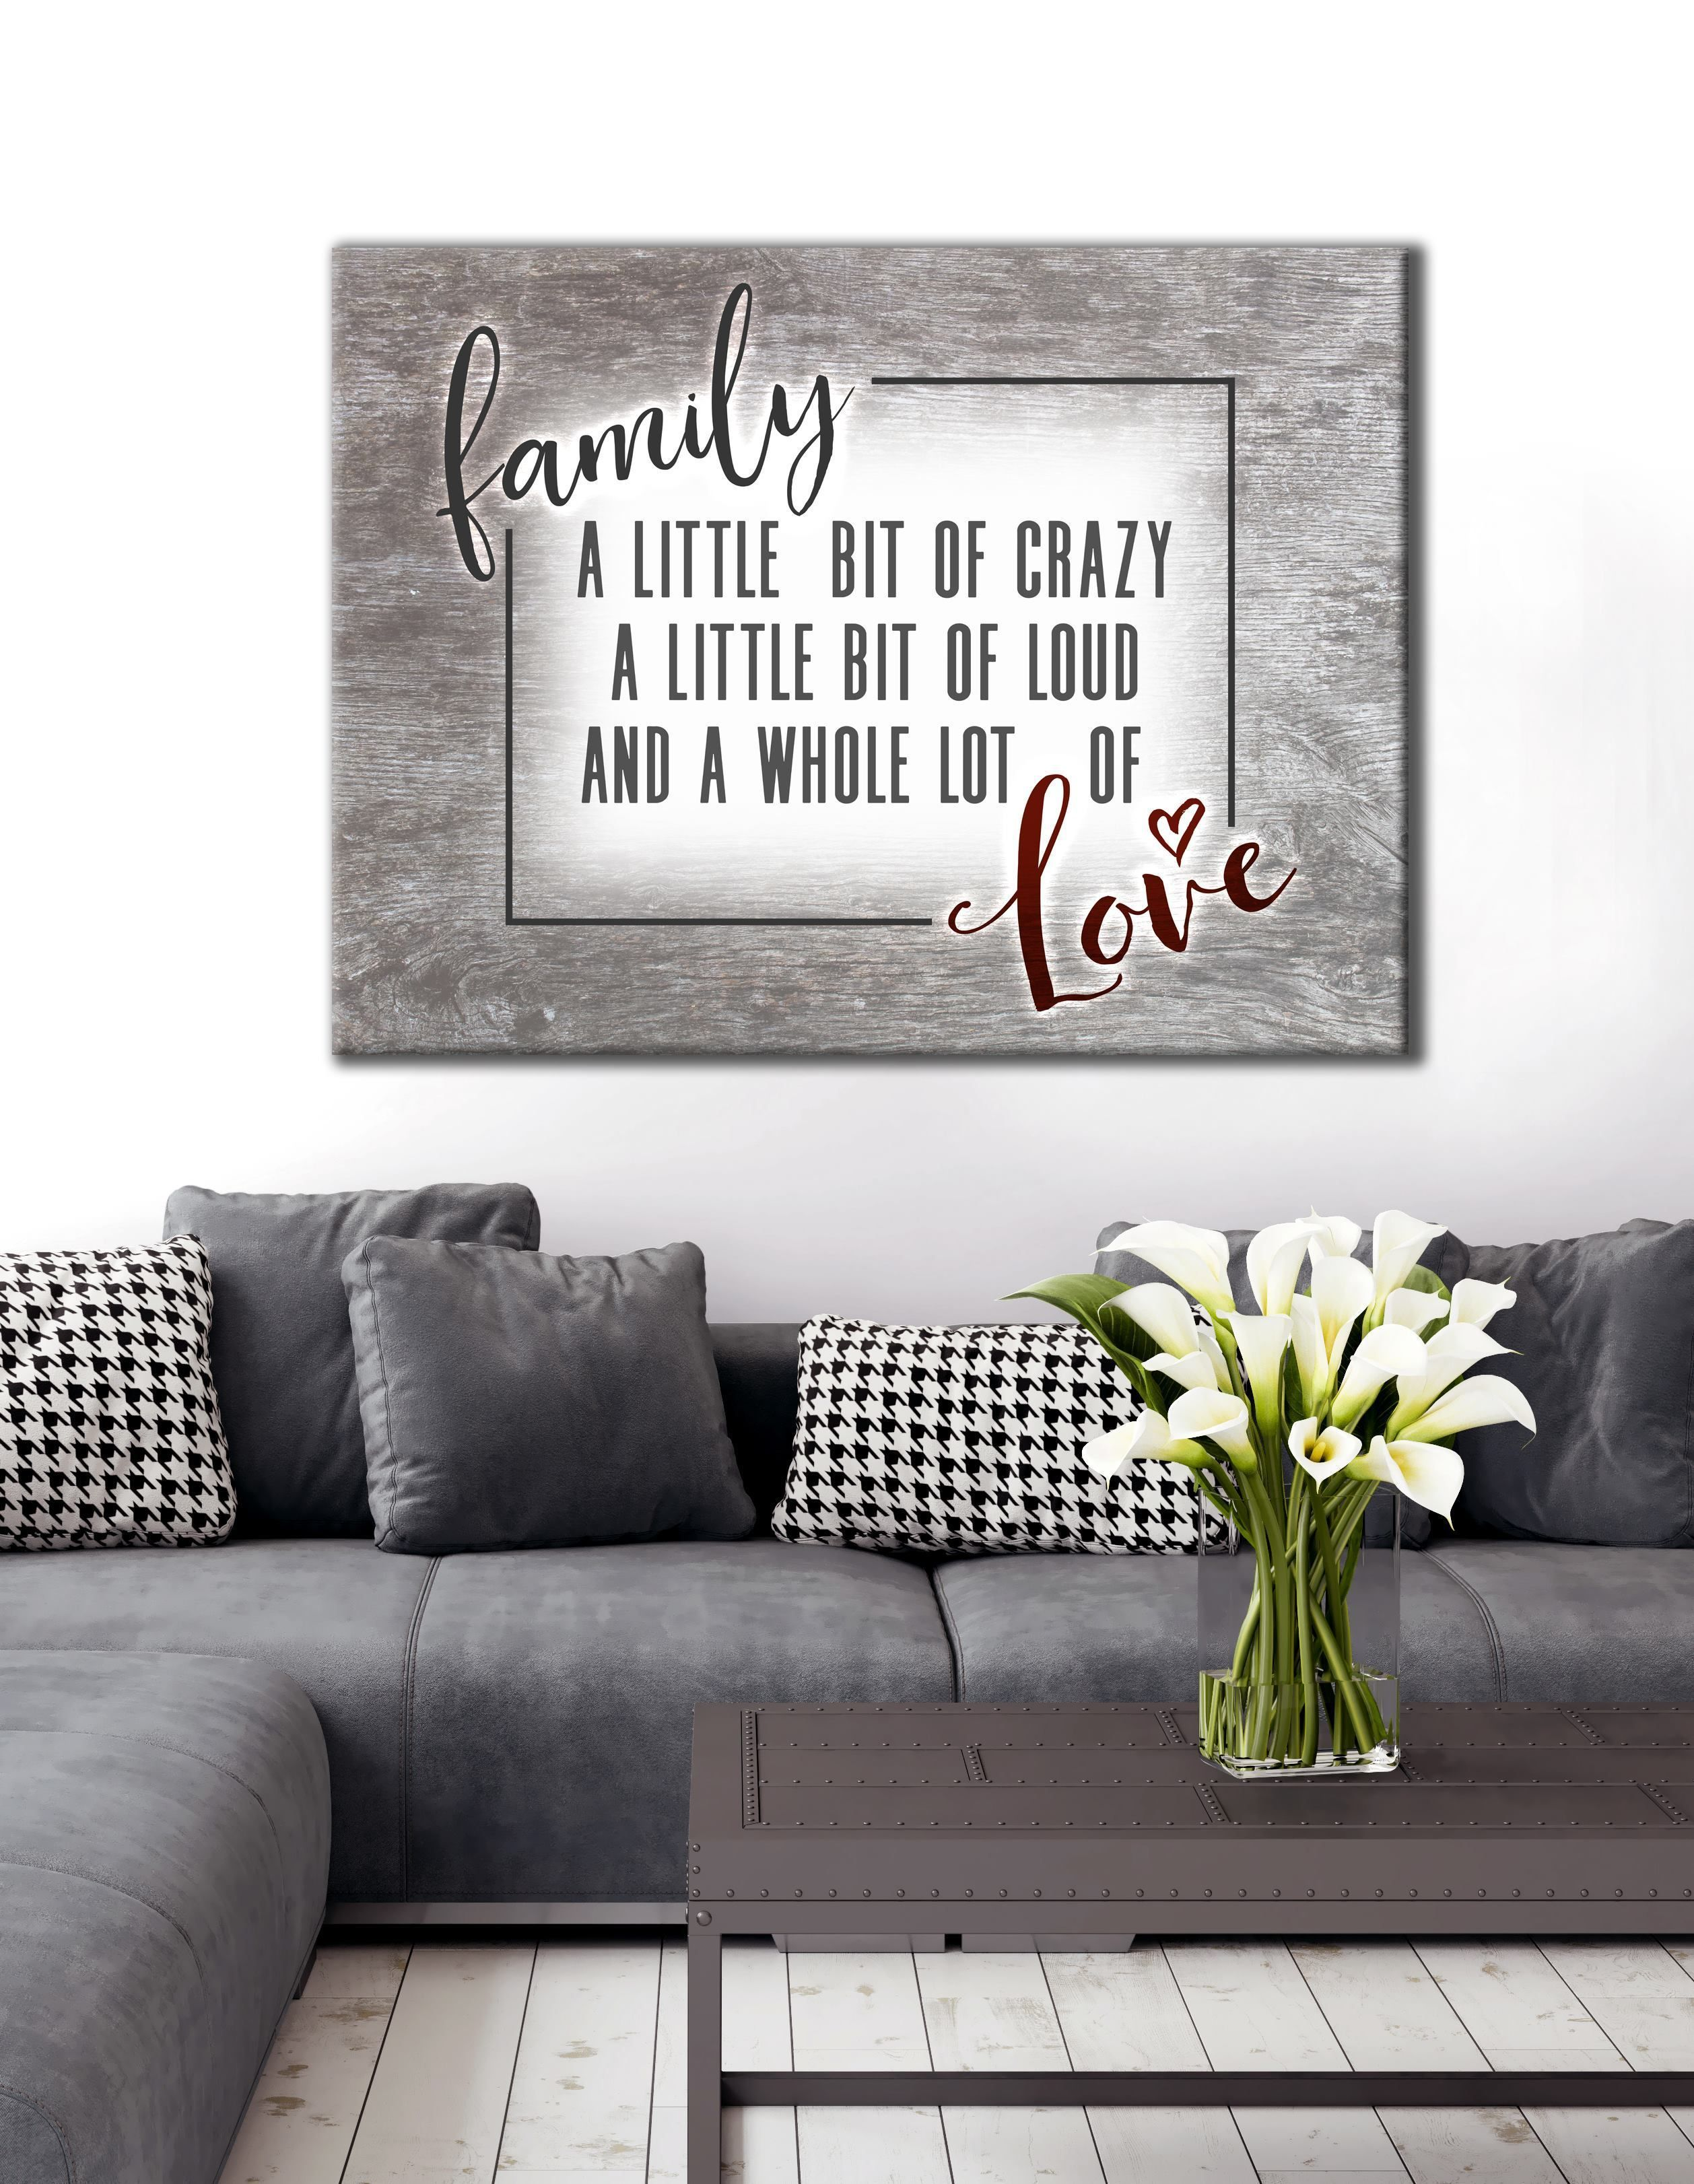 Family Wall Art Funny Crazy Family Saying Wood Frame Ready To Hang Family Wall Art Family Wall Canvas Art Wall Decor